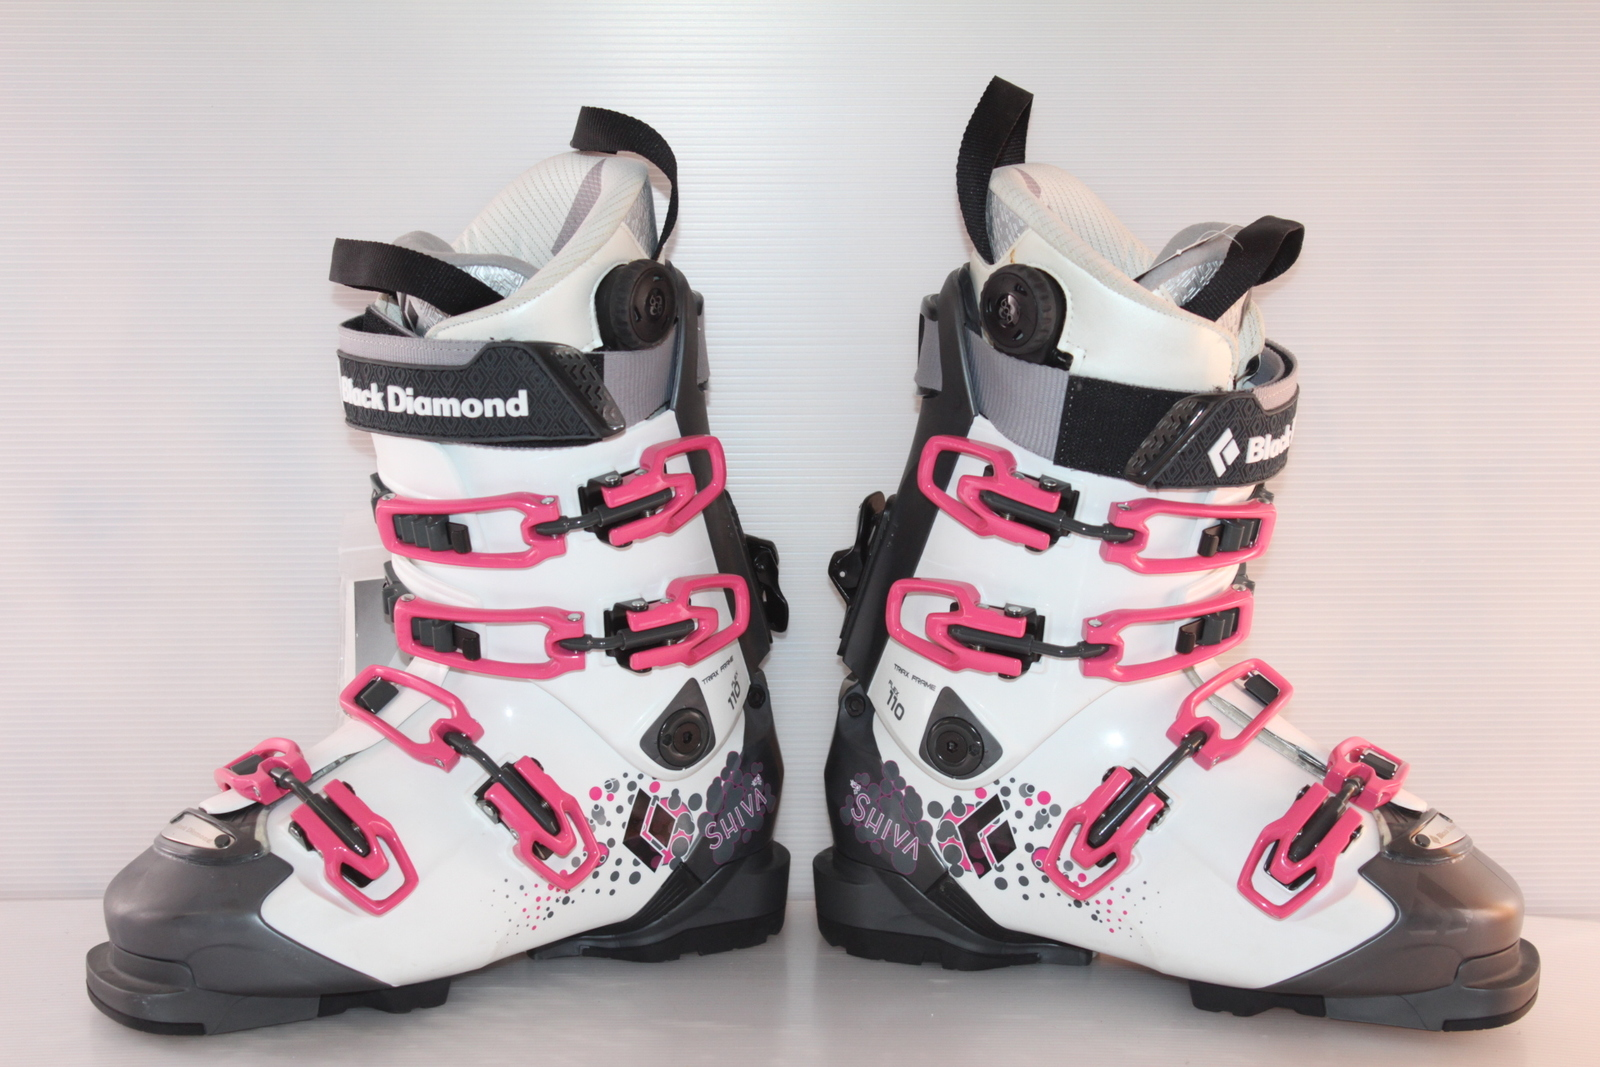 Dámské skialpové boty Black Diamond SHIVA - skialp vel. EU38.5 flexe 110